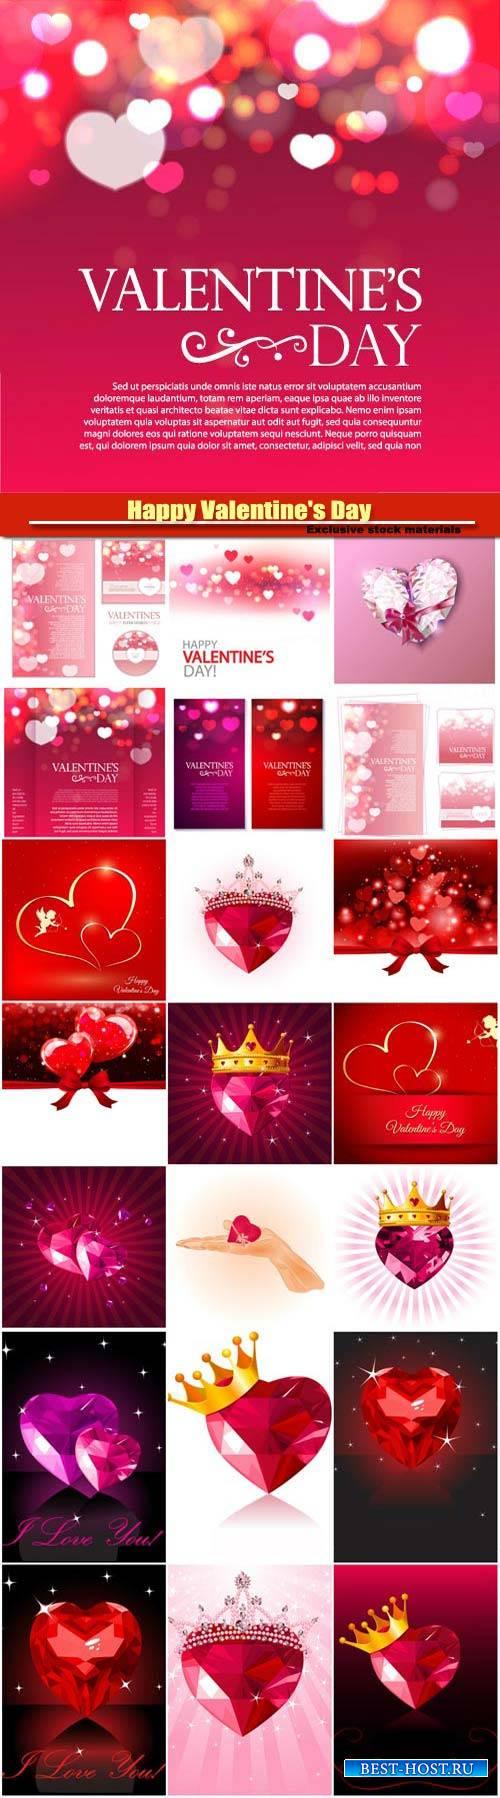 Happy Valentine's Day vector, hearts, romance, love #10